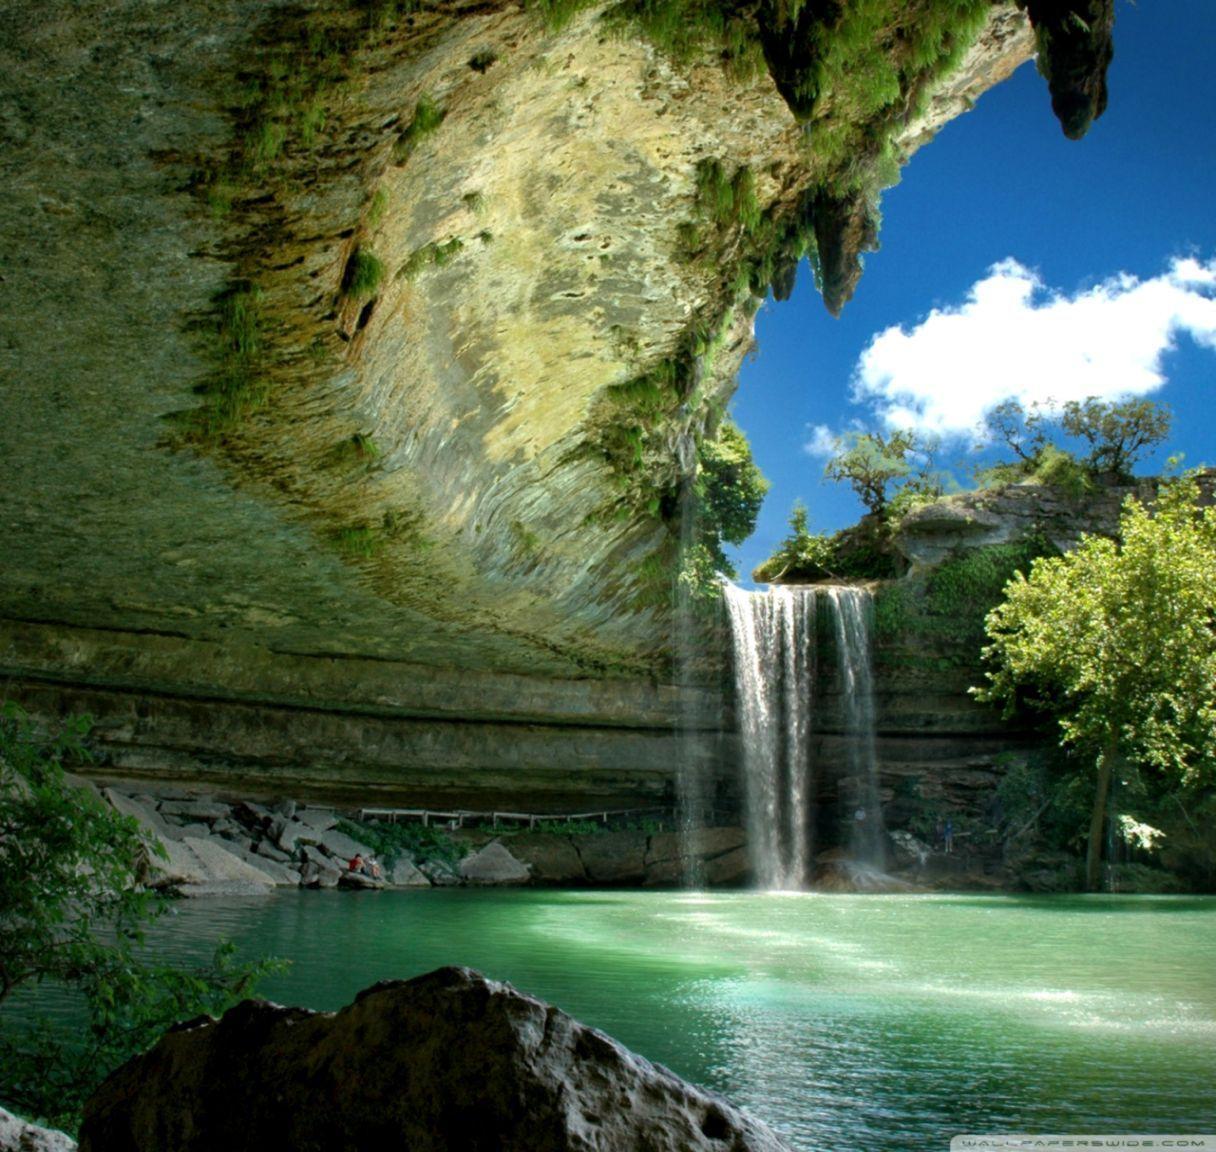 Waterfall Desktop Wallpapers Top Free Waterfall Desktop Backgrounds Wallpaperaccess